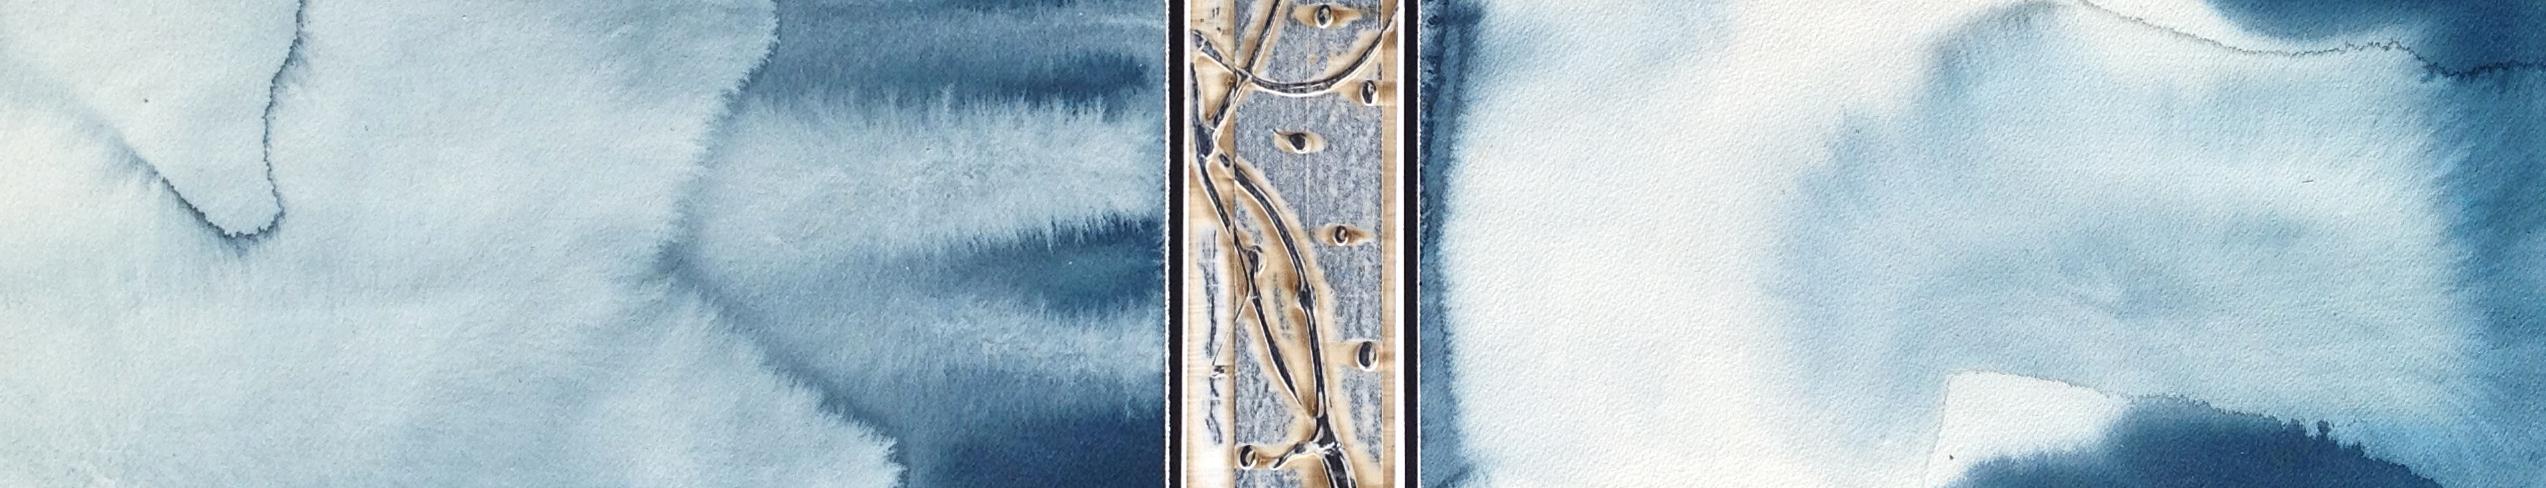 Skyclips (5) by Mr. Michael Kessler - Masterpiece Online